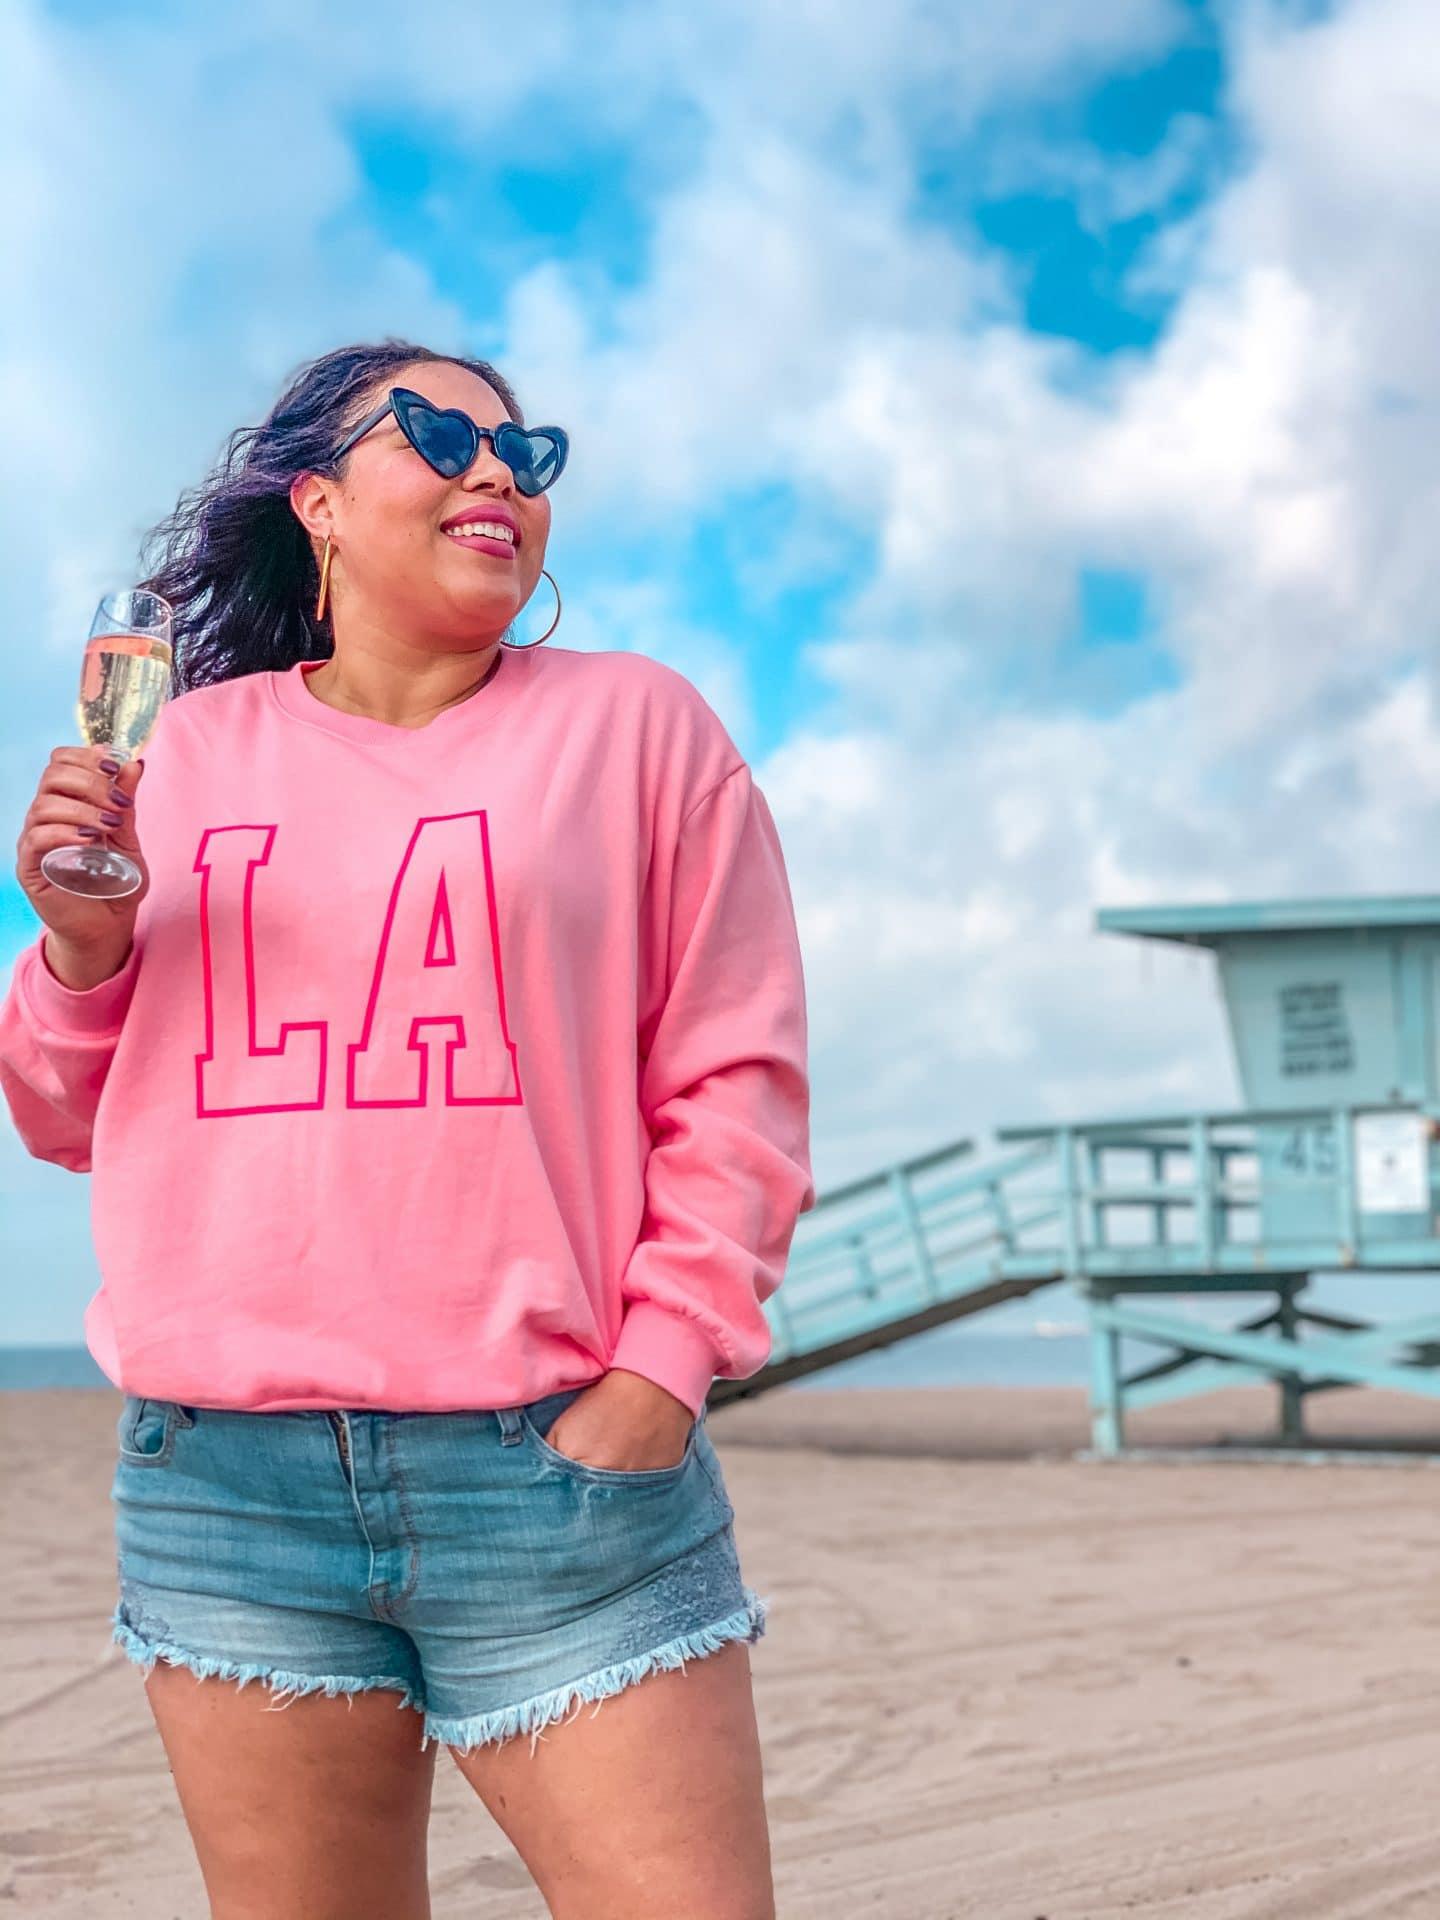 pink la sweatshirt and jean shorts on los angeles, playa del rey beach